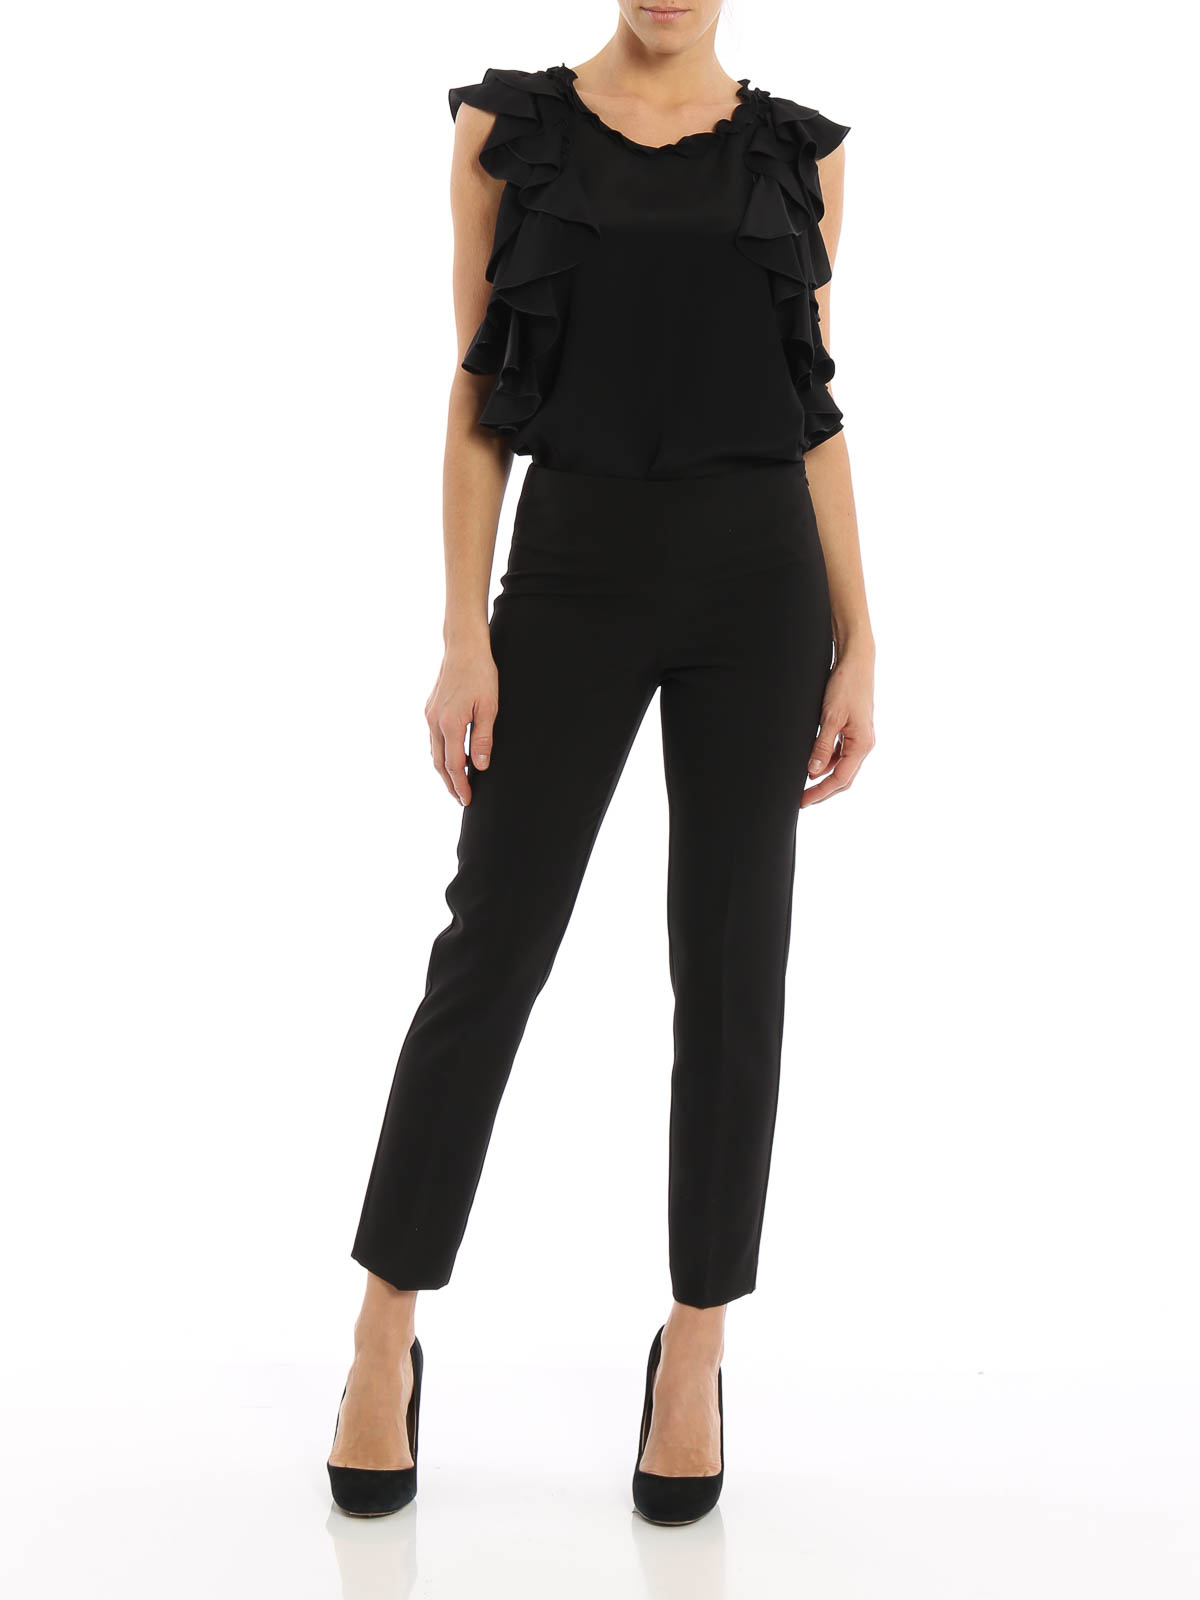 76ade4bc13 Blumarine - Pantalón De Vestir Negro Para Mujer - Pantalones de ...